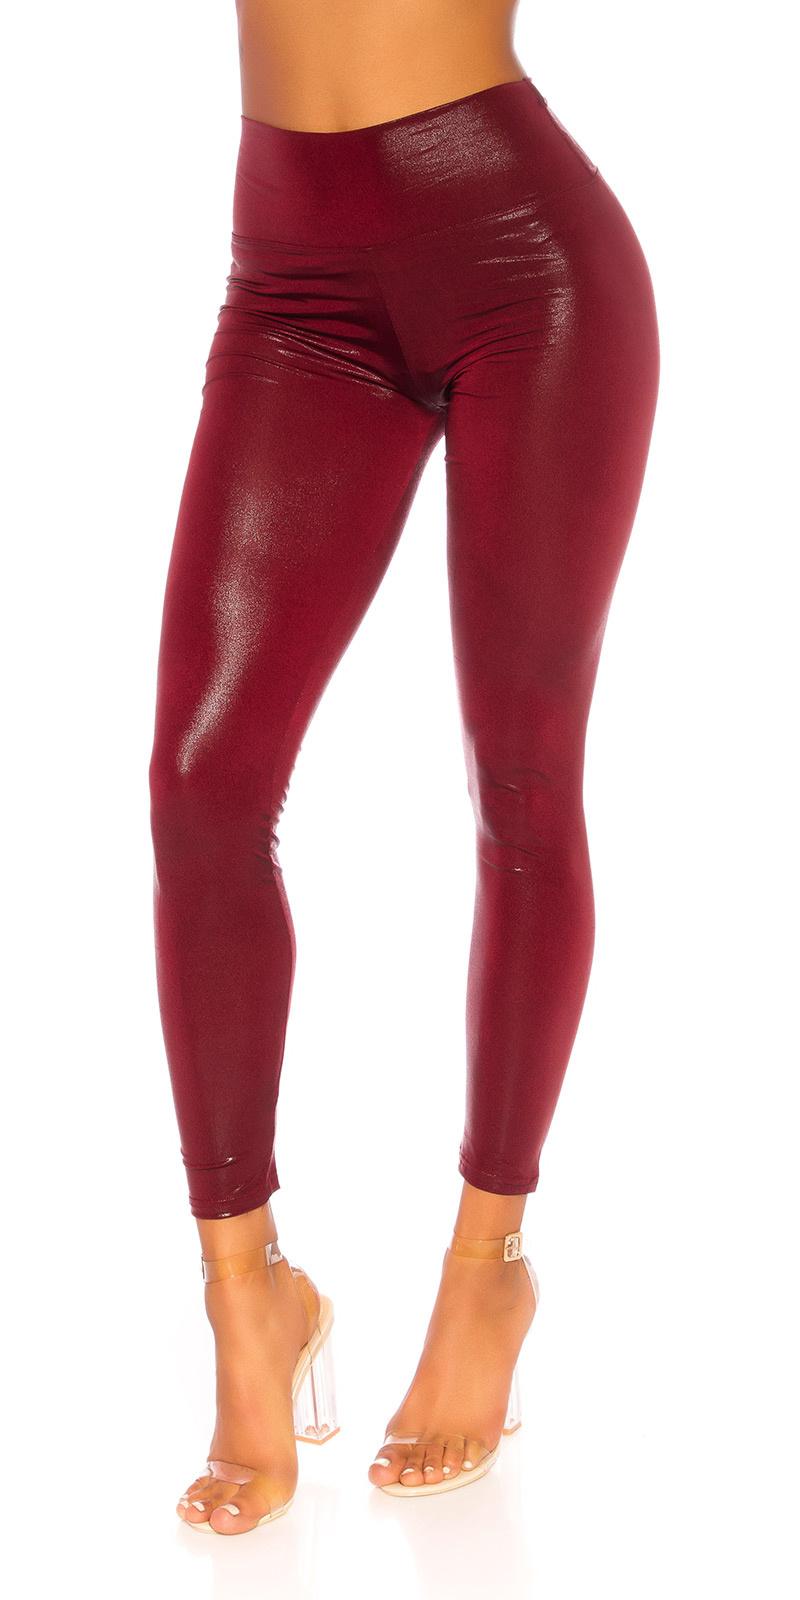 Sexy shiny leggings bordeaux